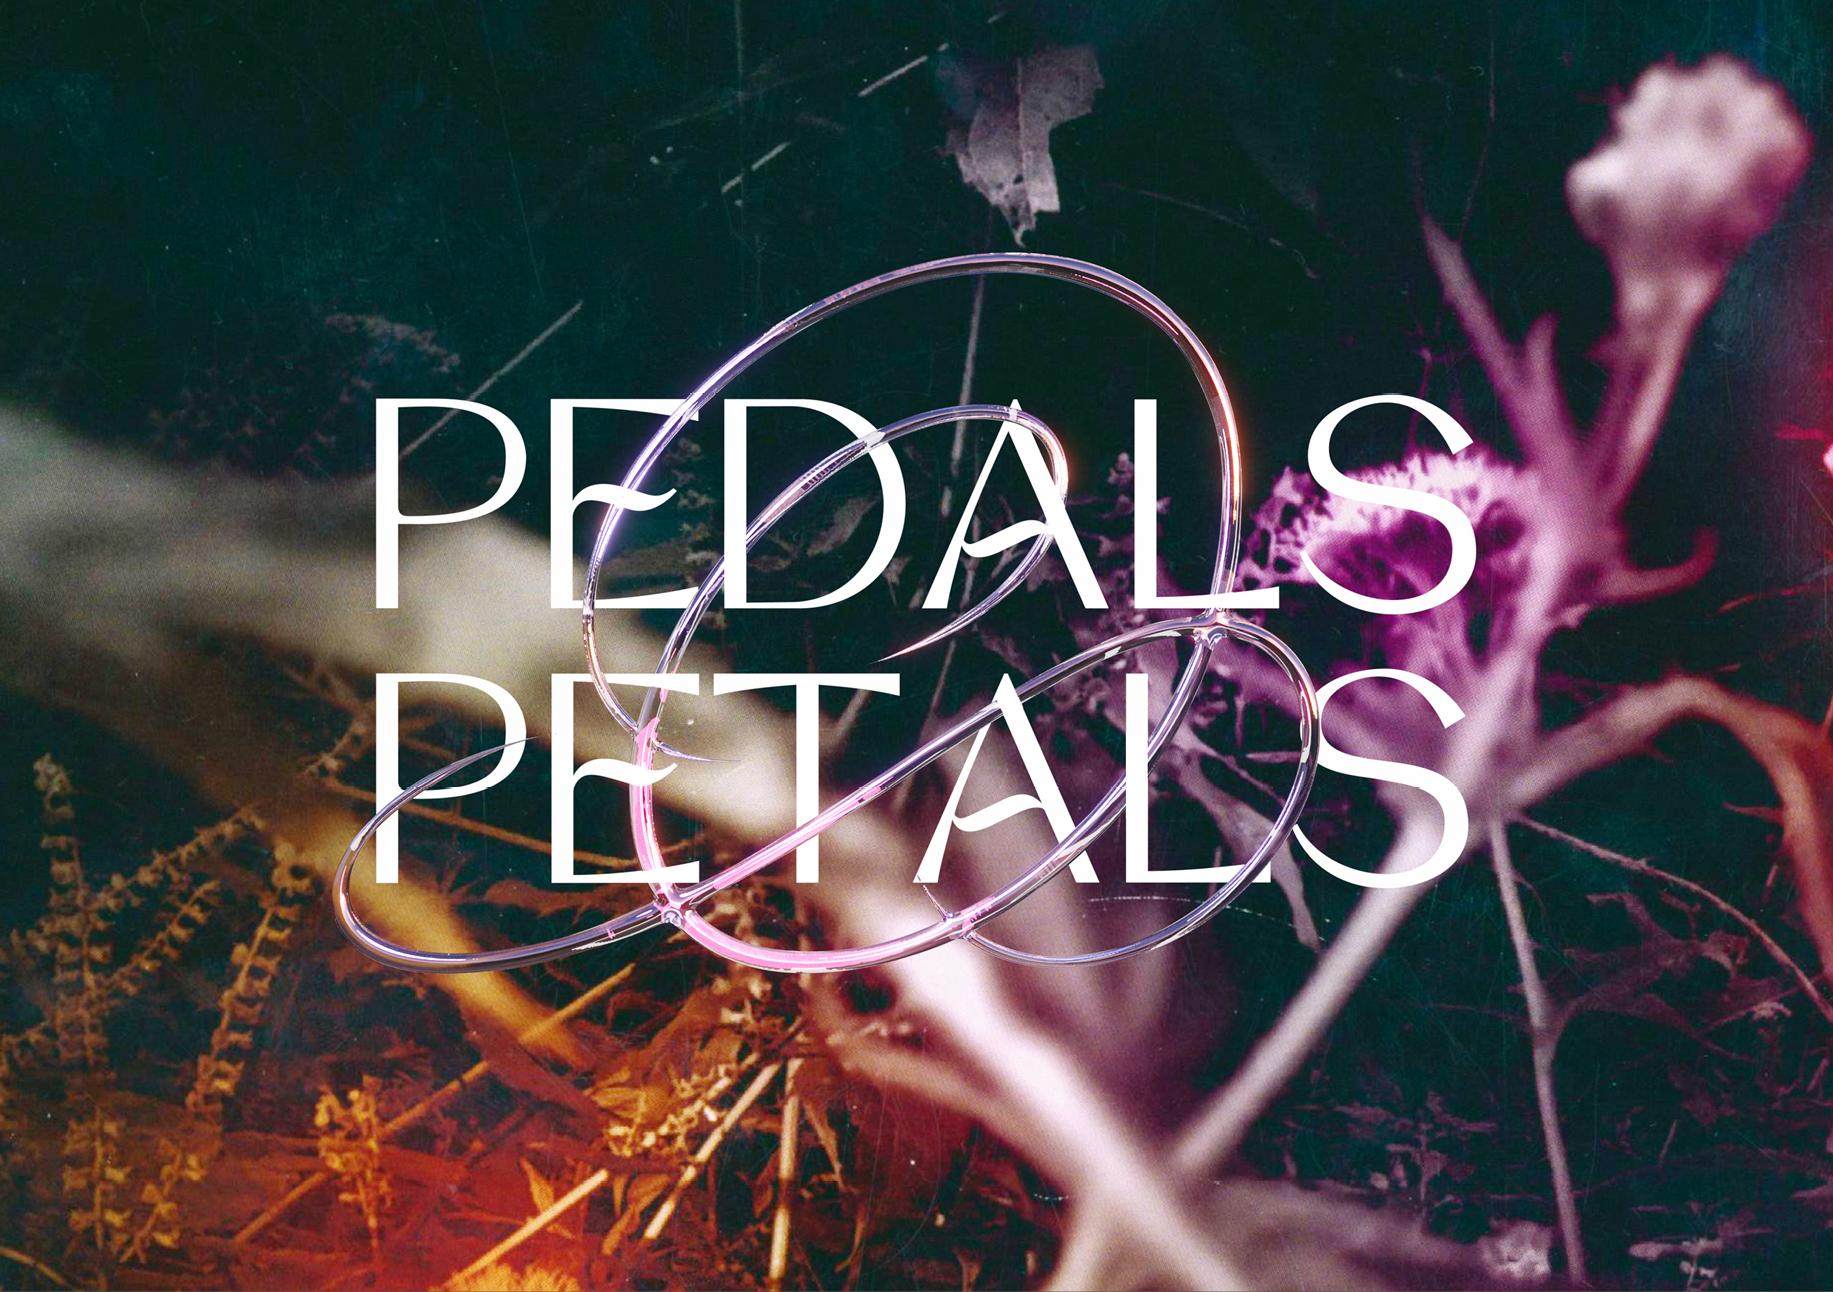 Pedals & Petals Lukas Röber Call for Creatives